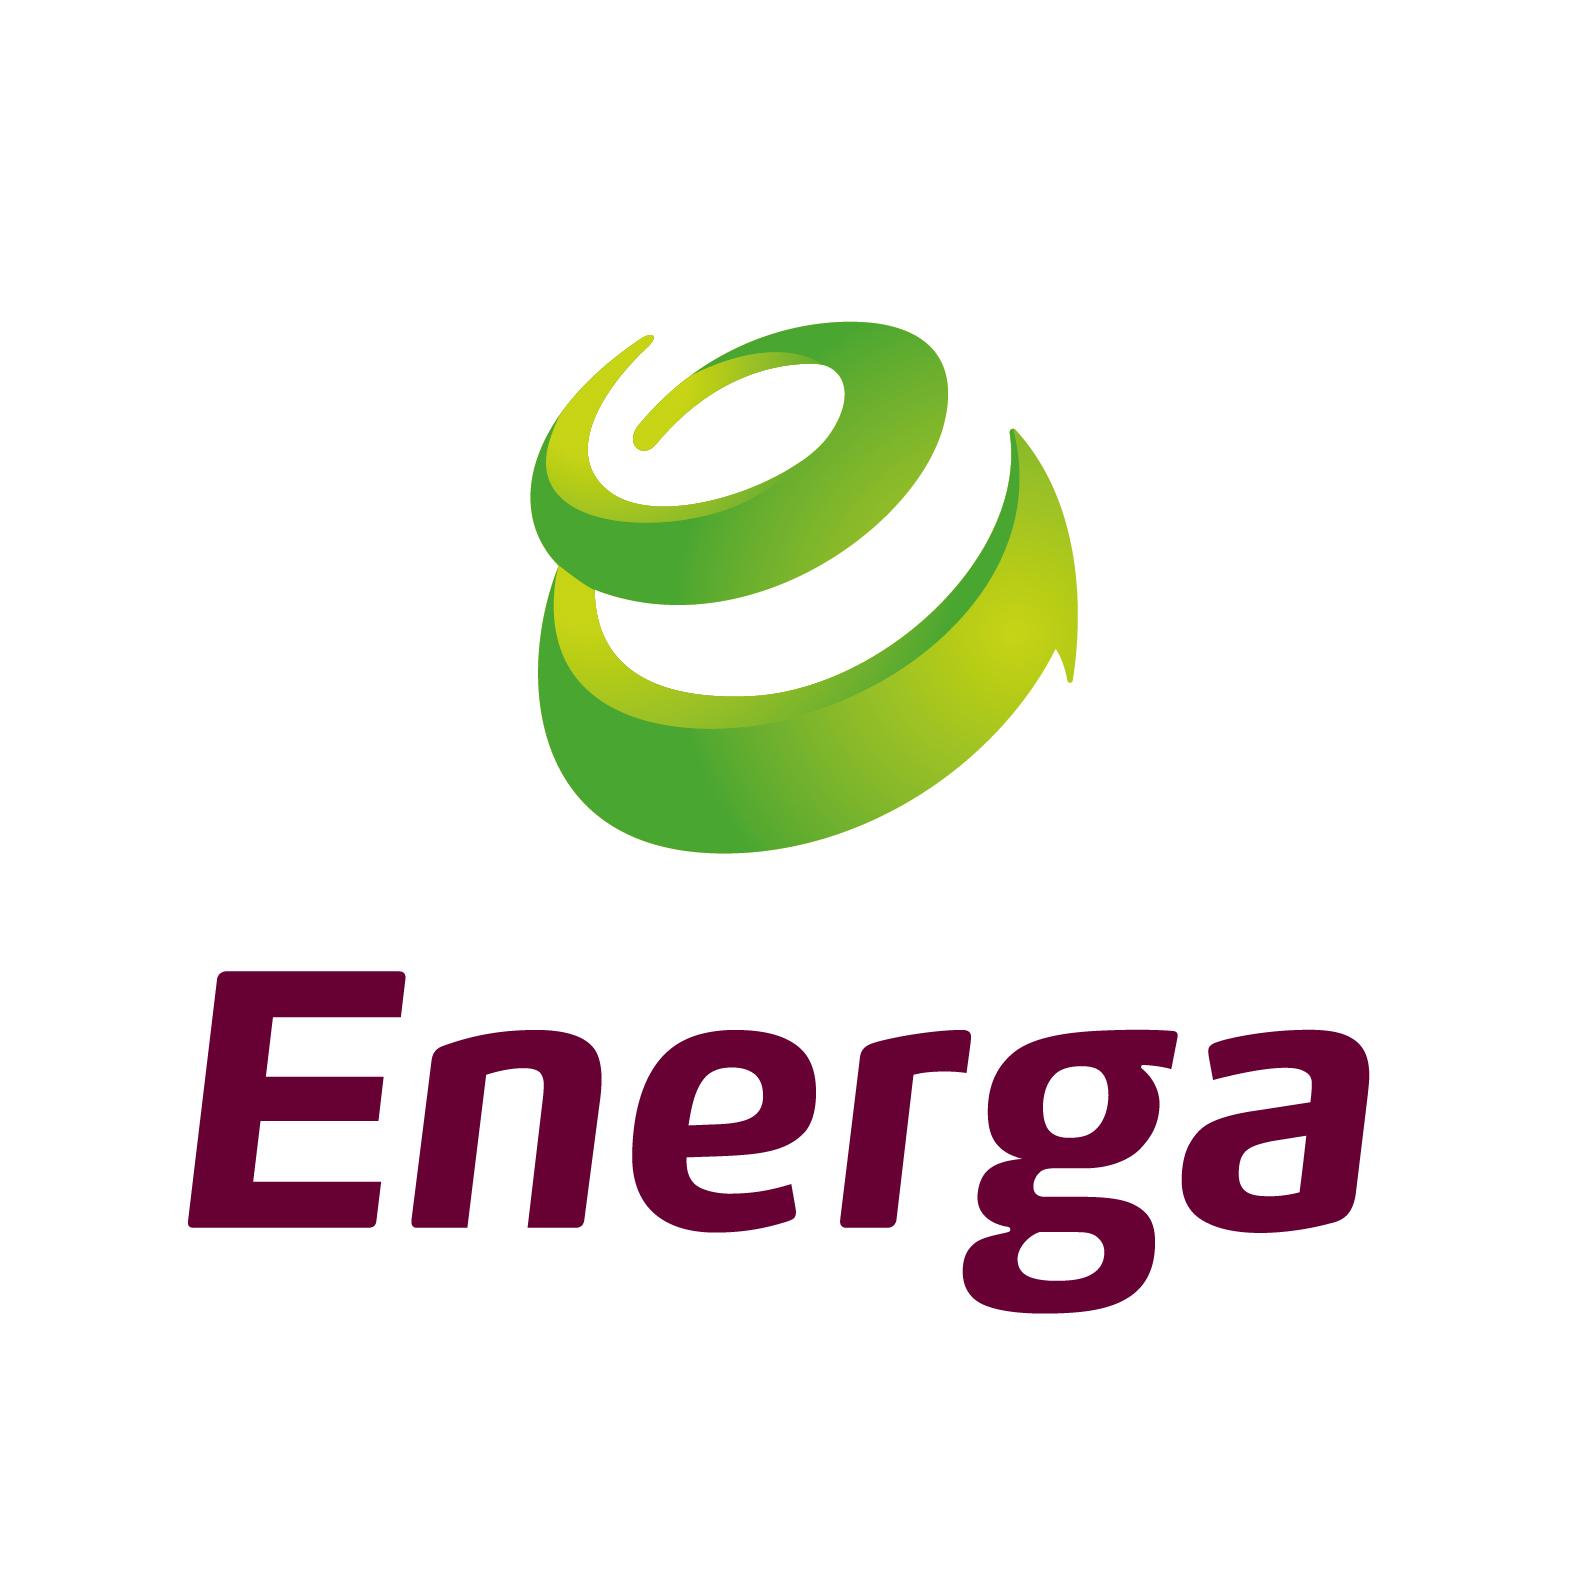 Energa.pl